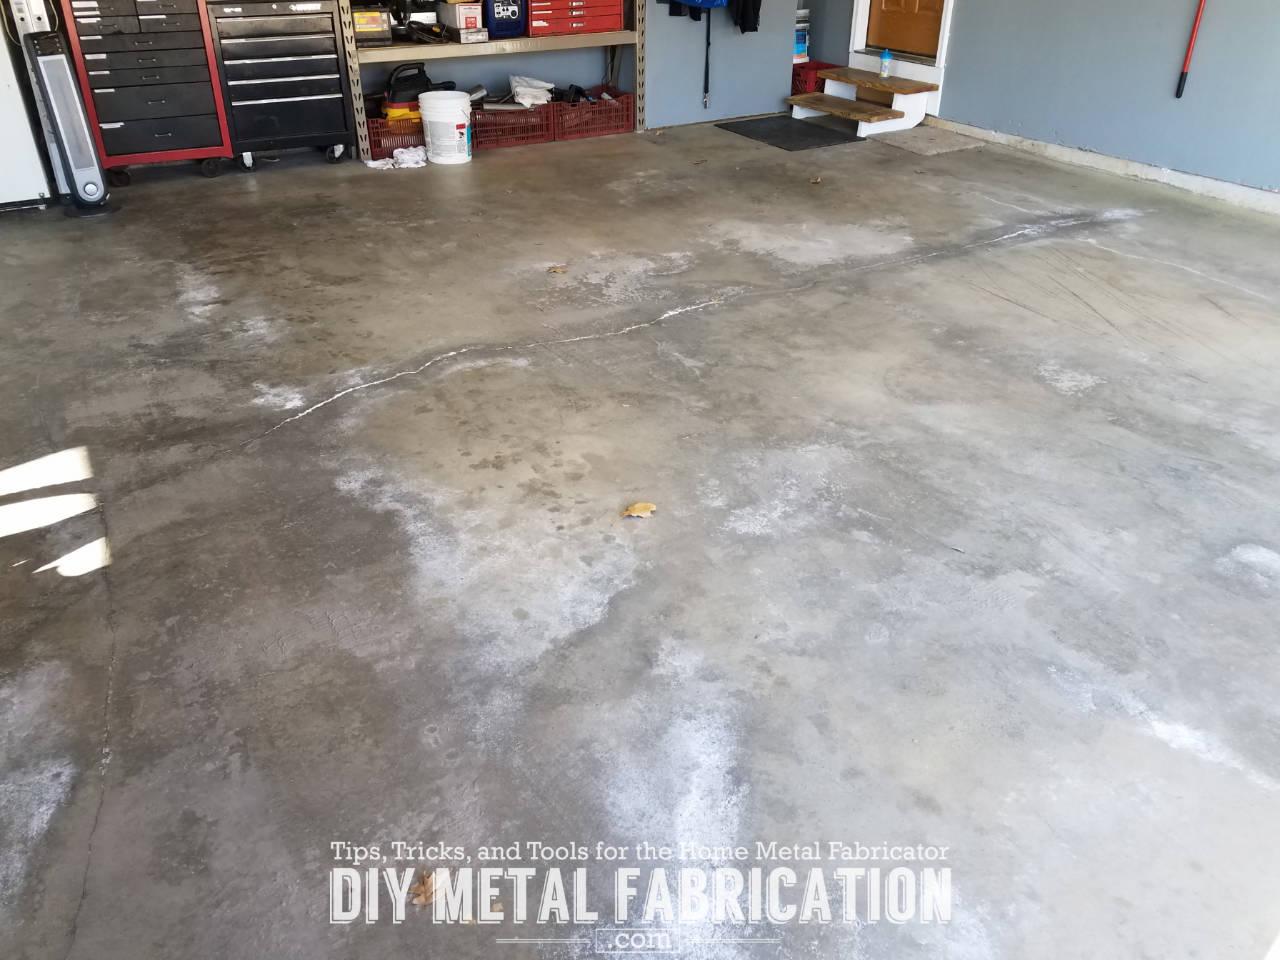 Diy How To Seal Garage Floor Diy Metal Fabrication Com